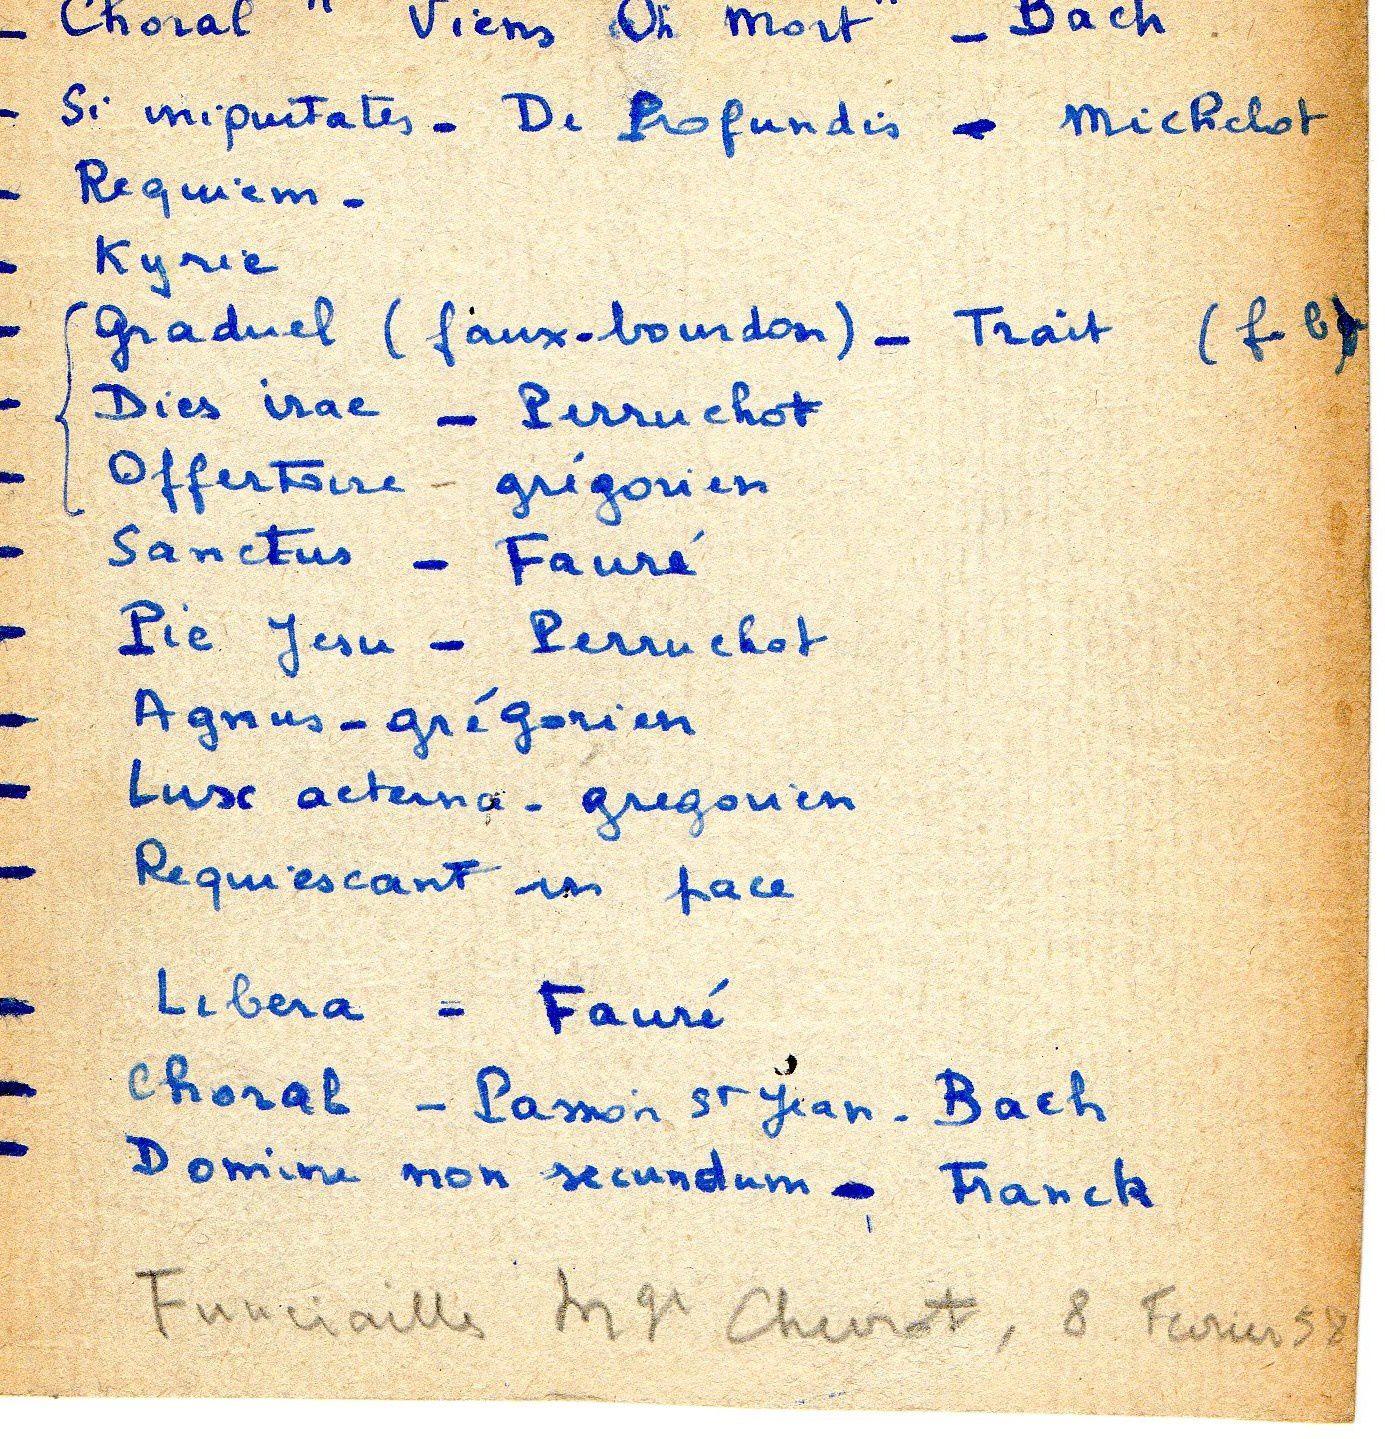 Obsèques de Monseigneur Chevrot : programme musical.